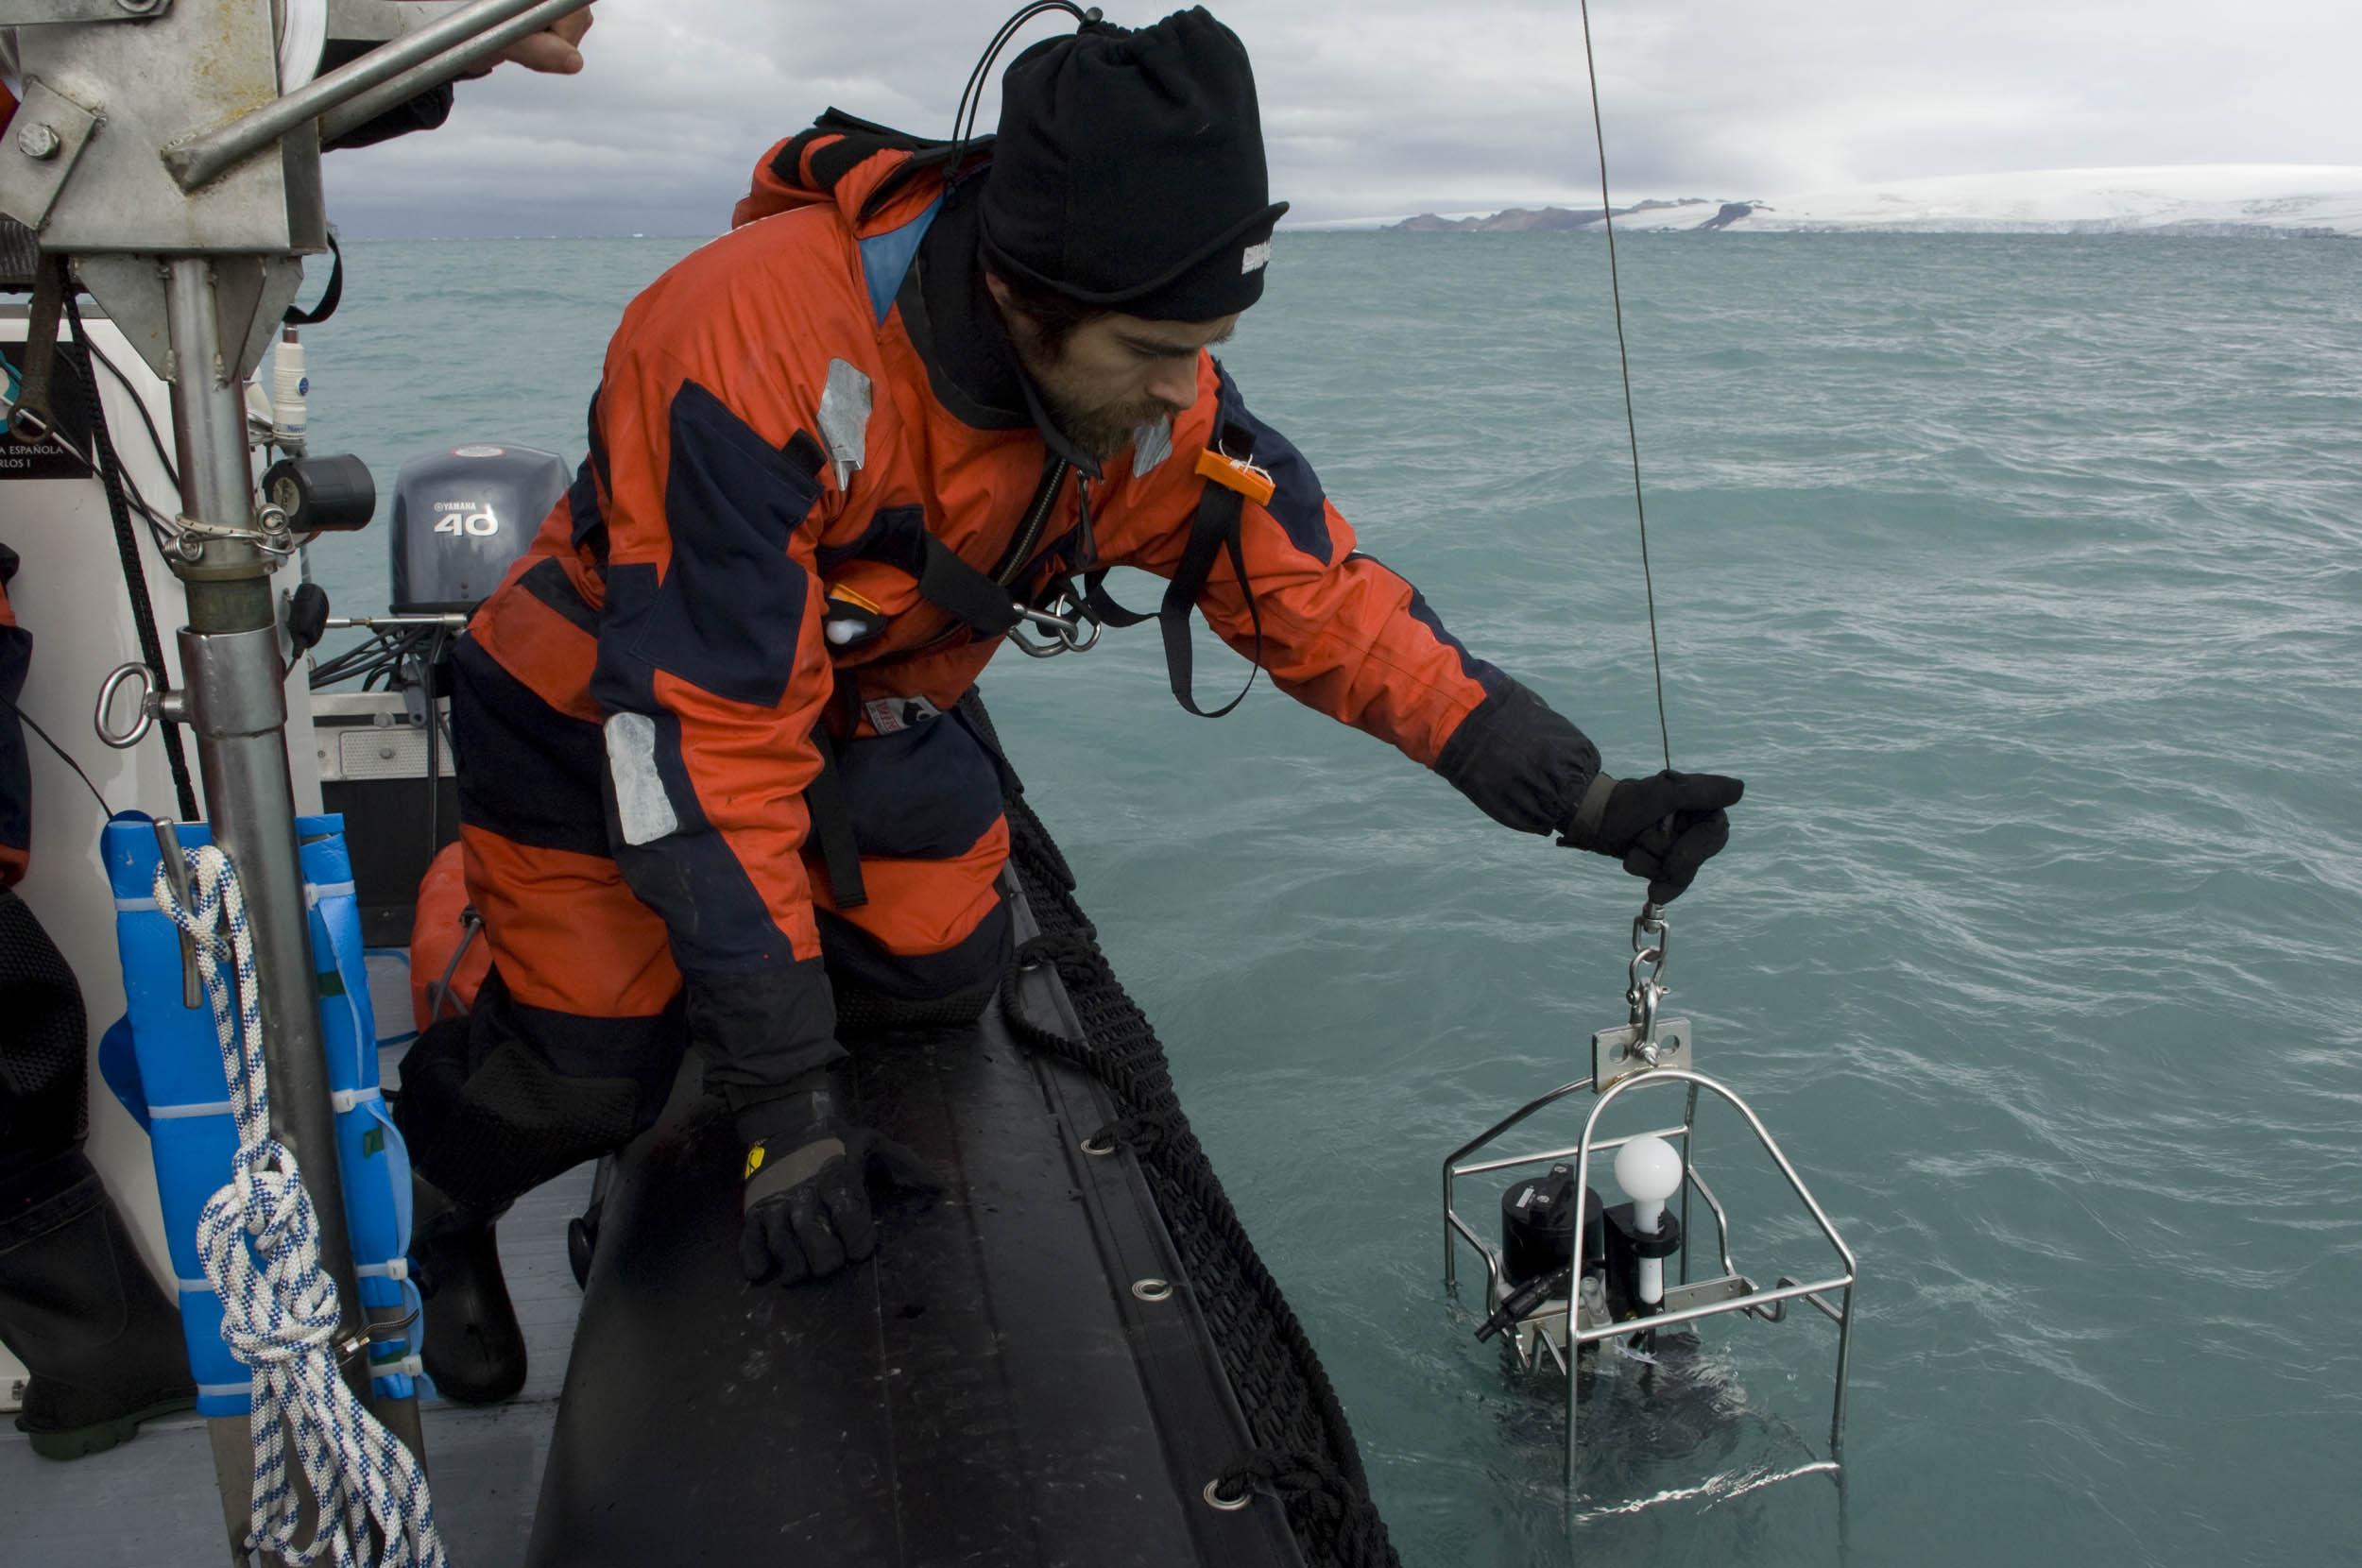 Muestreo, Antártida - Gaia - Hector Garrido, Aerial and human photography